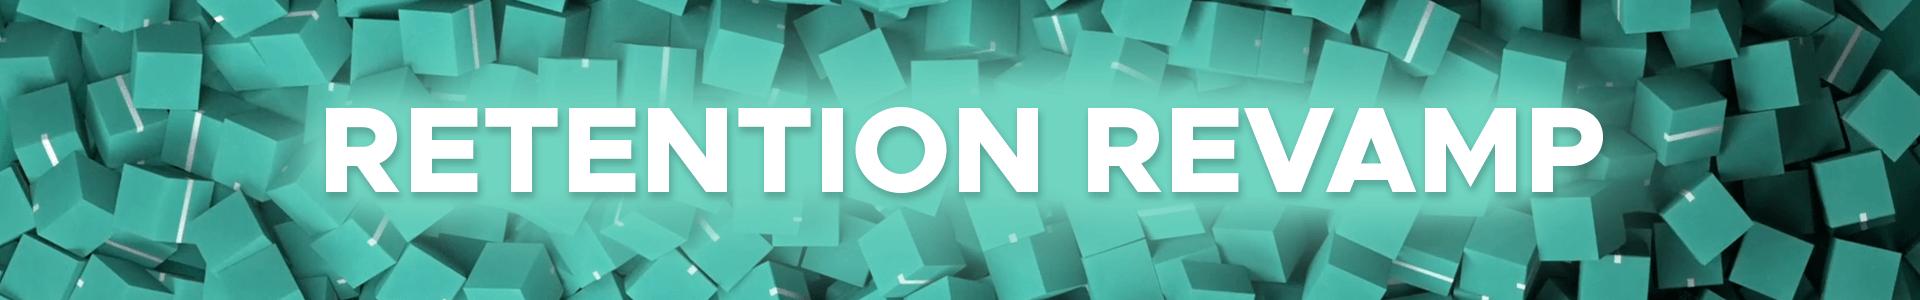 Retention-Revamp